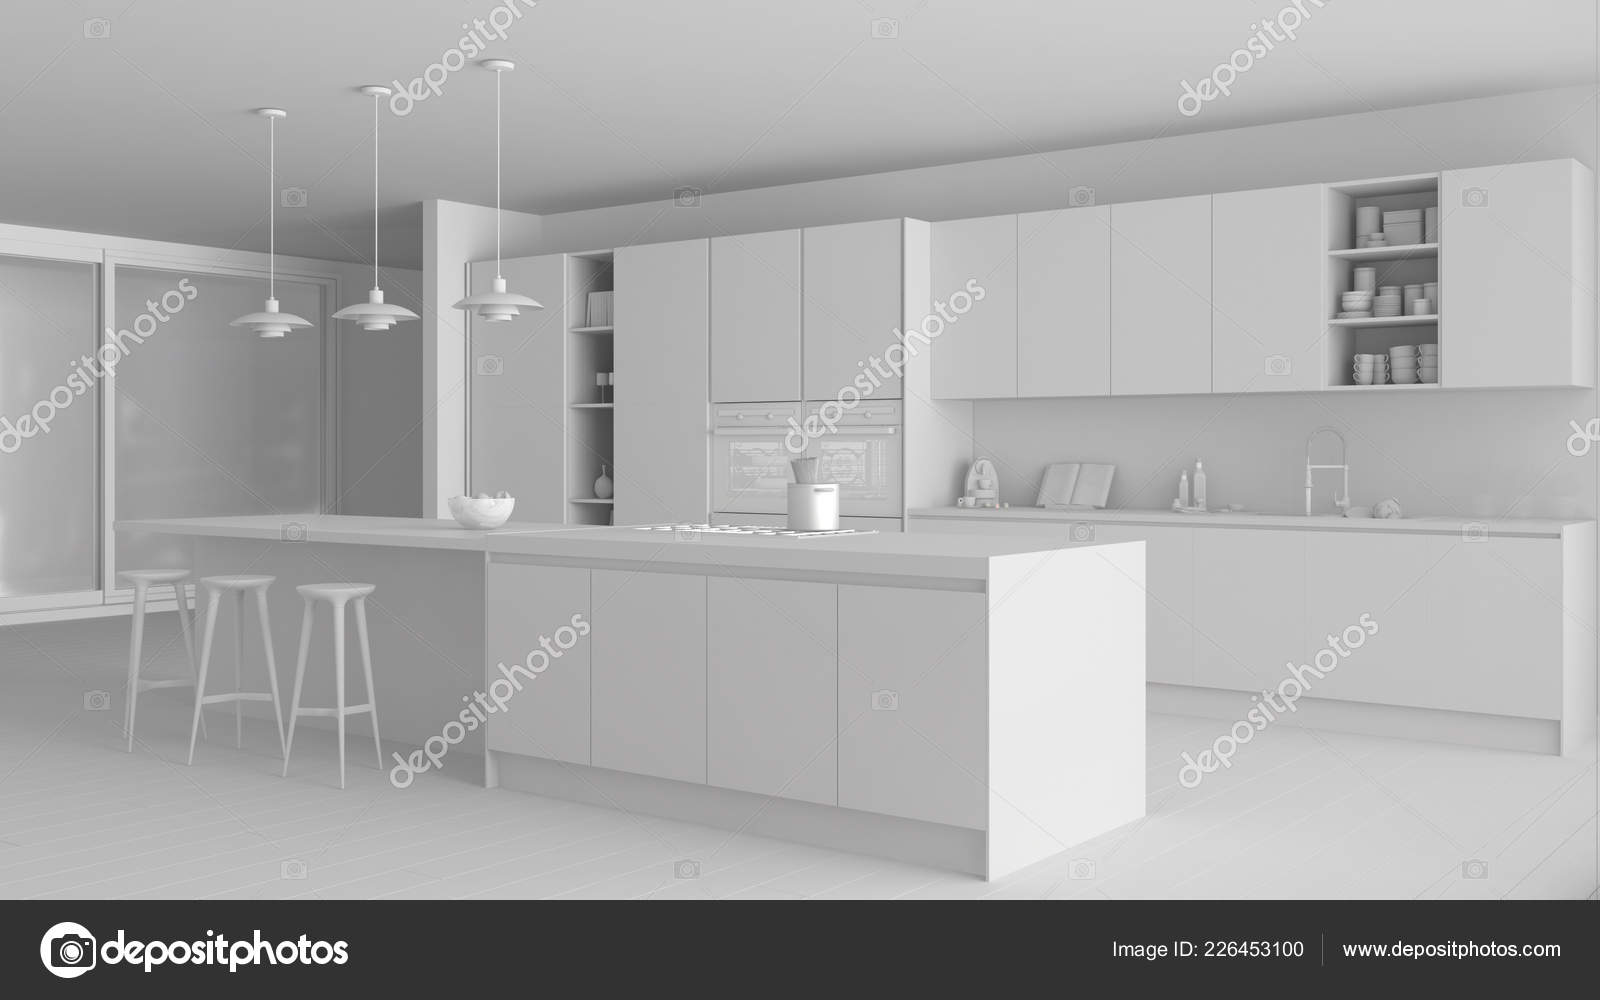 islands for the kitchen compact table 全白工程的现代简约厨房与岛屿和大全景窗口 镶木地板 吊灯 当代建筑 镶木